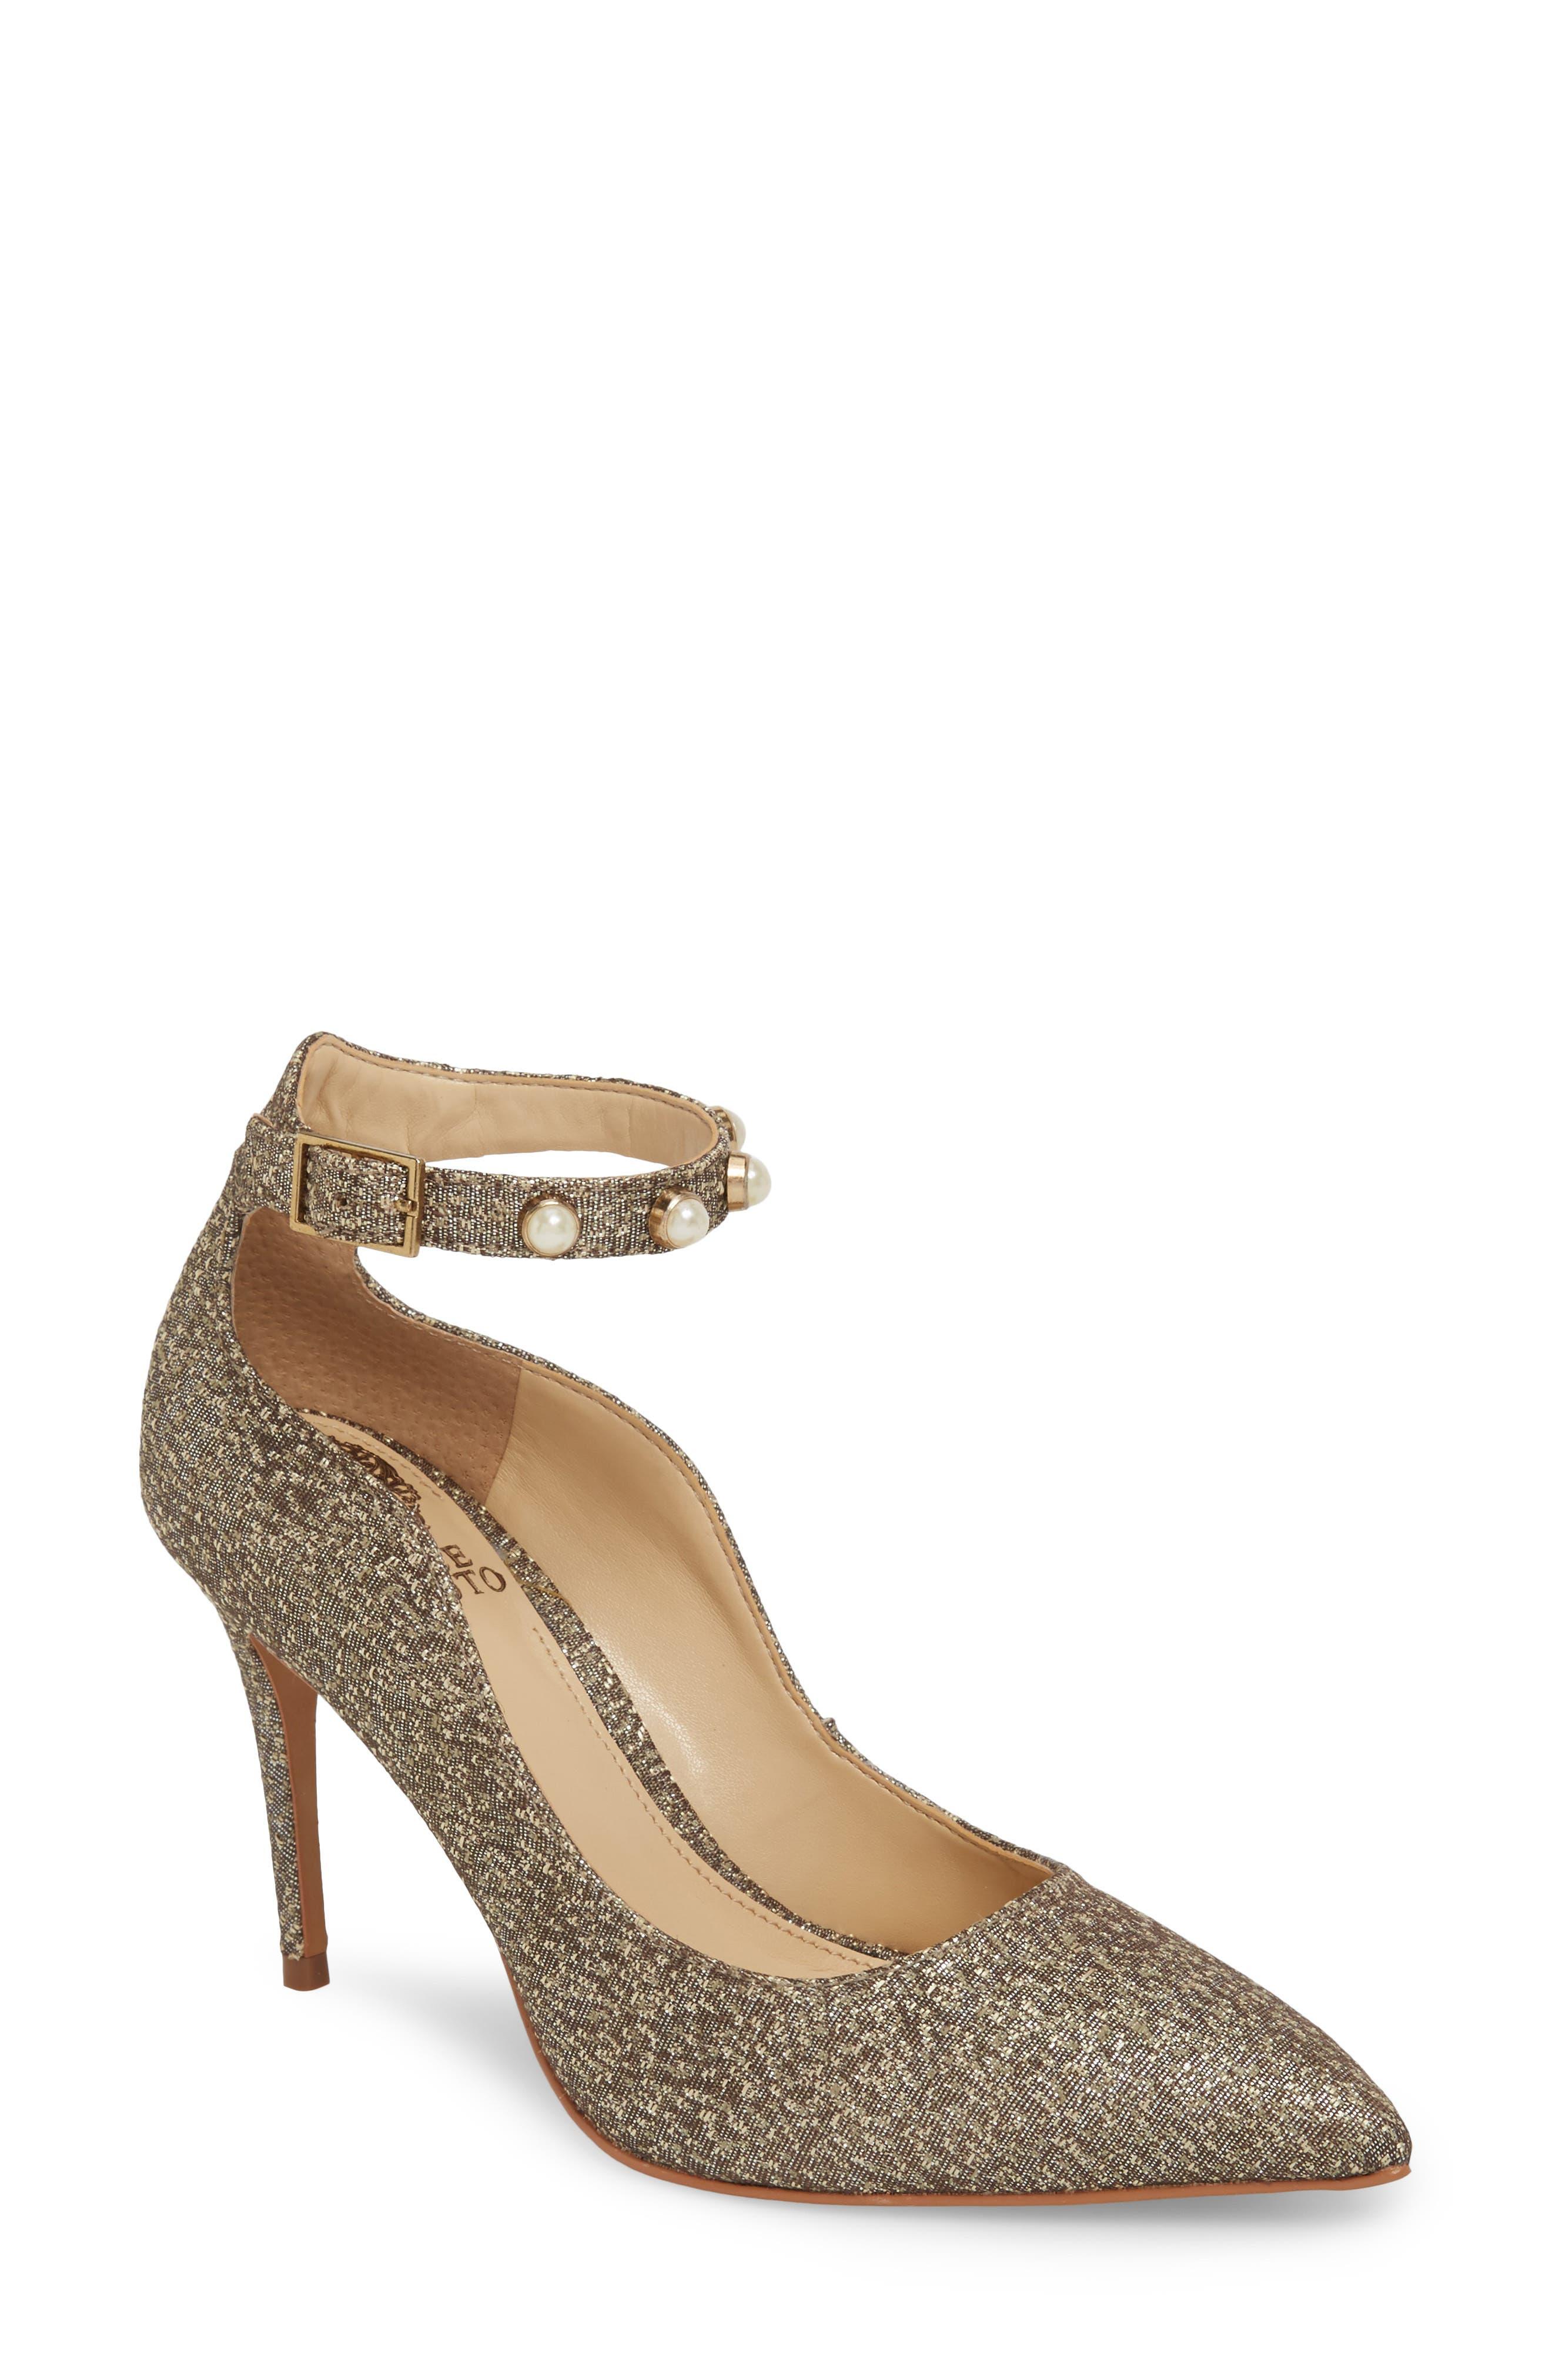 Vine Camuto Jassita Ankle Strap Pump,                         Main,                         color, Bronze